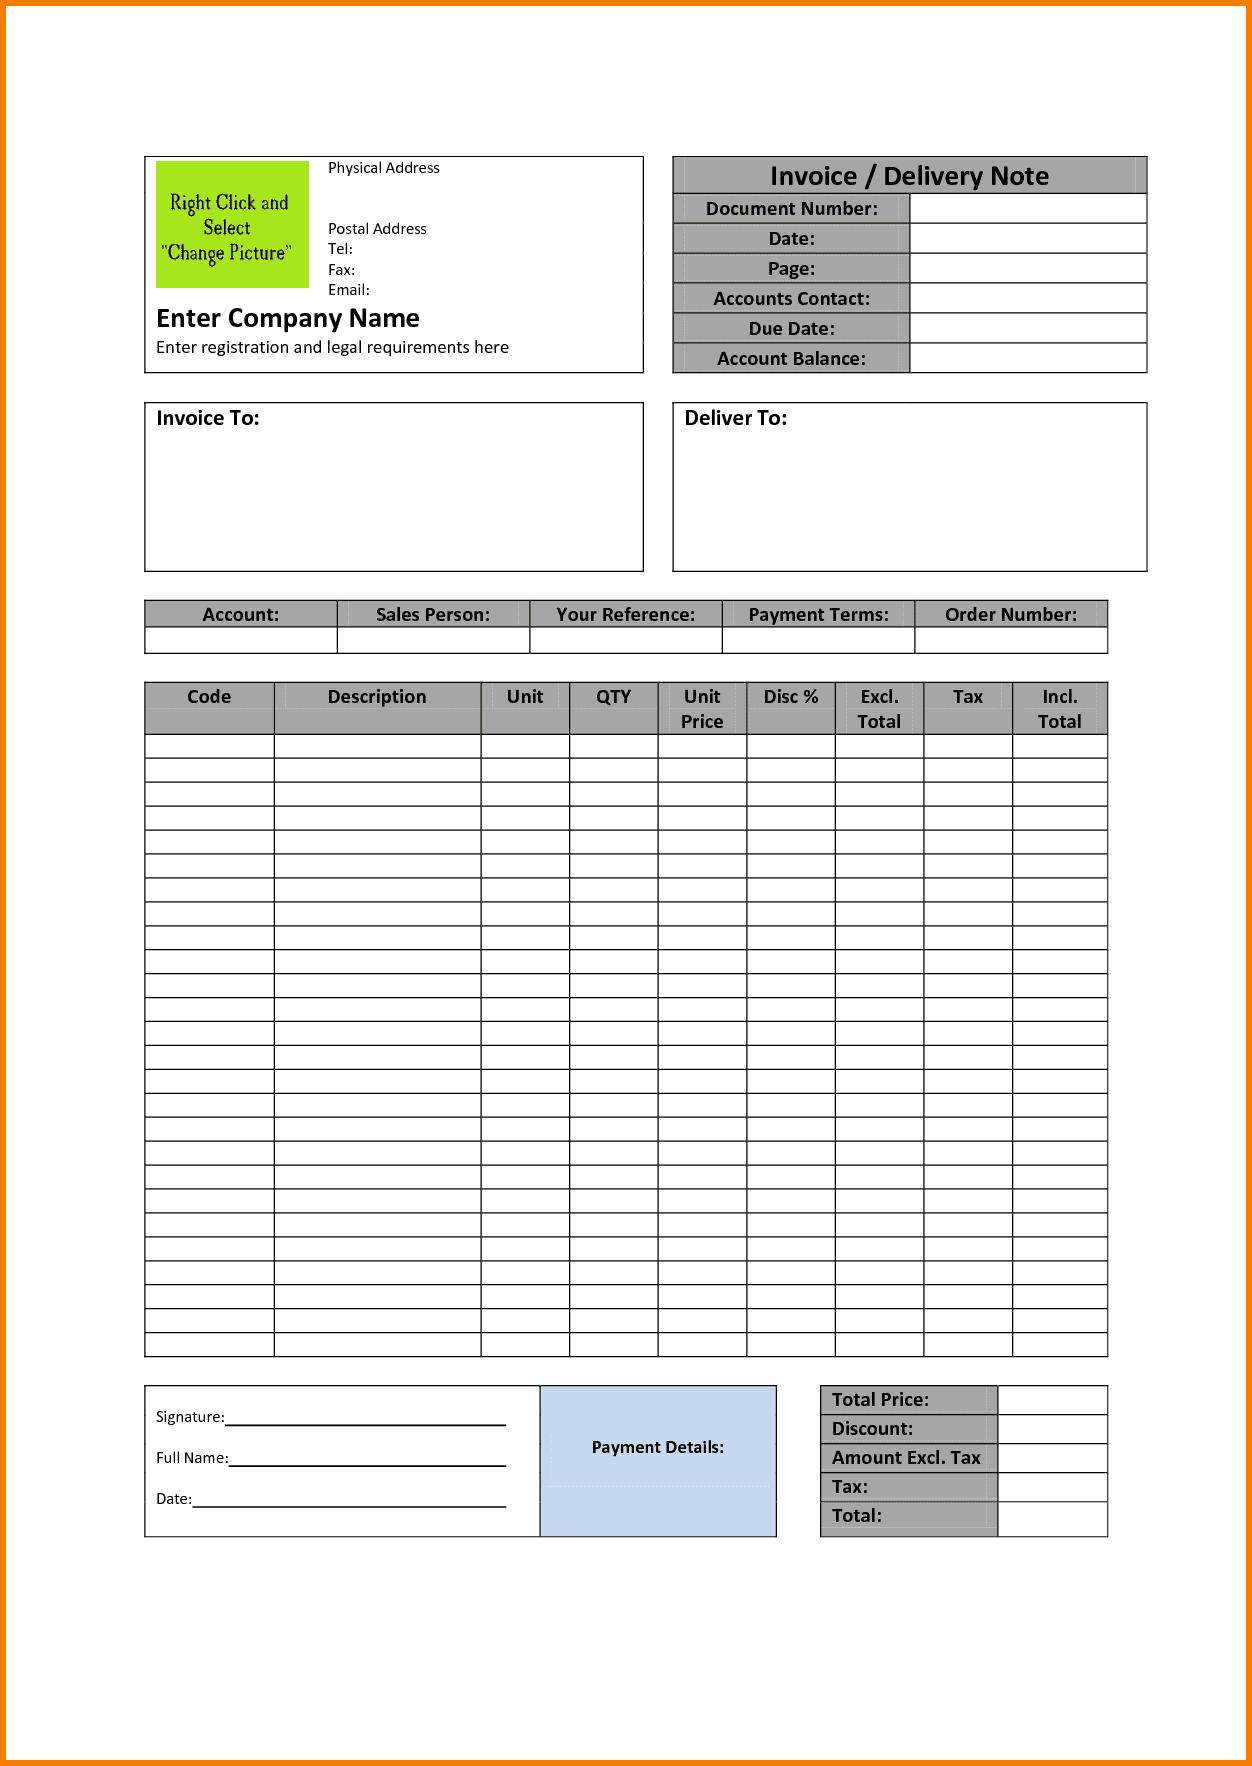 Rent Invoice Sample Rent Invoice Template Spreadsheet Templates for Busines Spreadsheet Templates for Busines Rent Receipt Template Free Printable